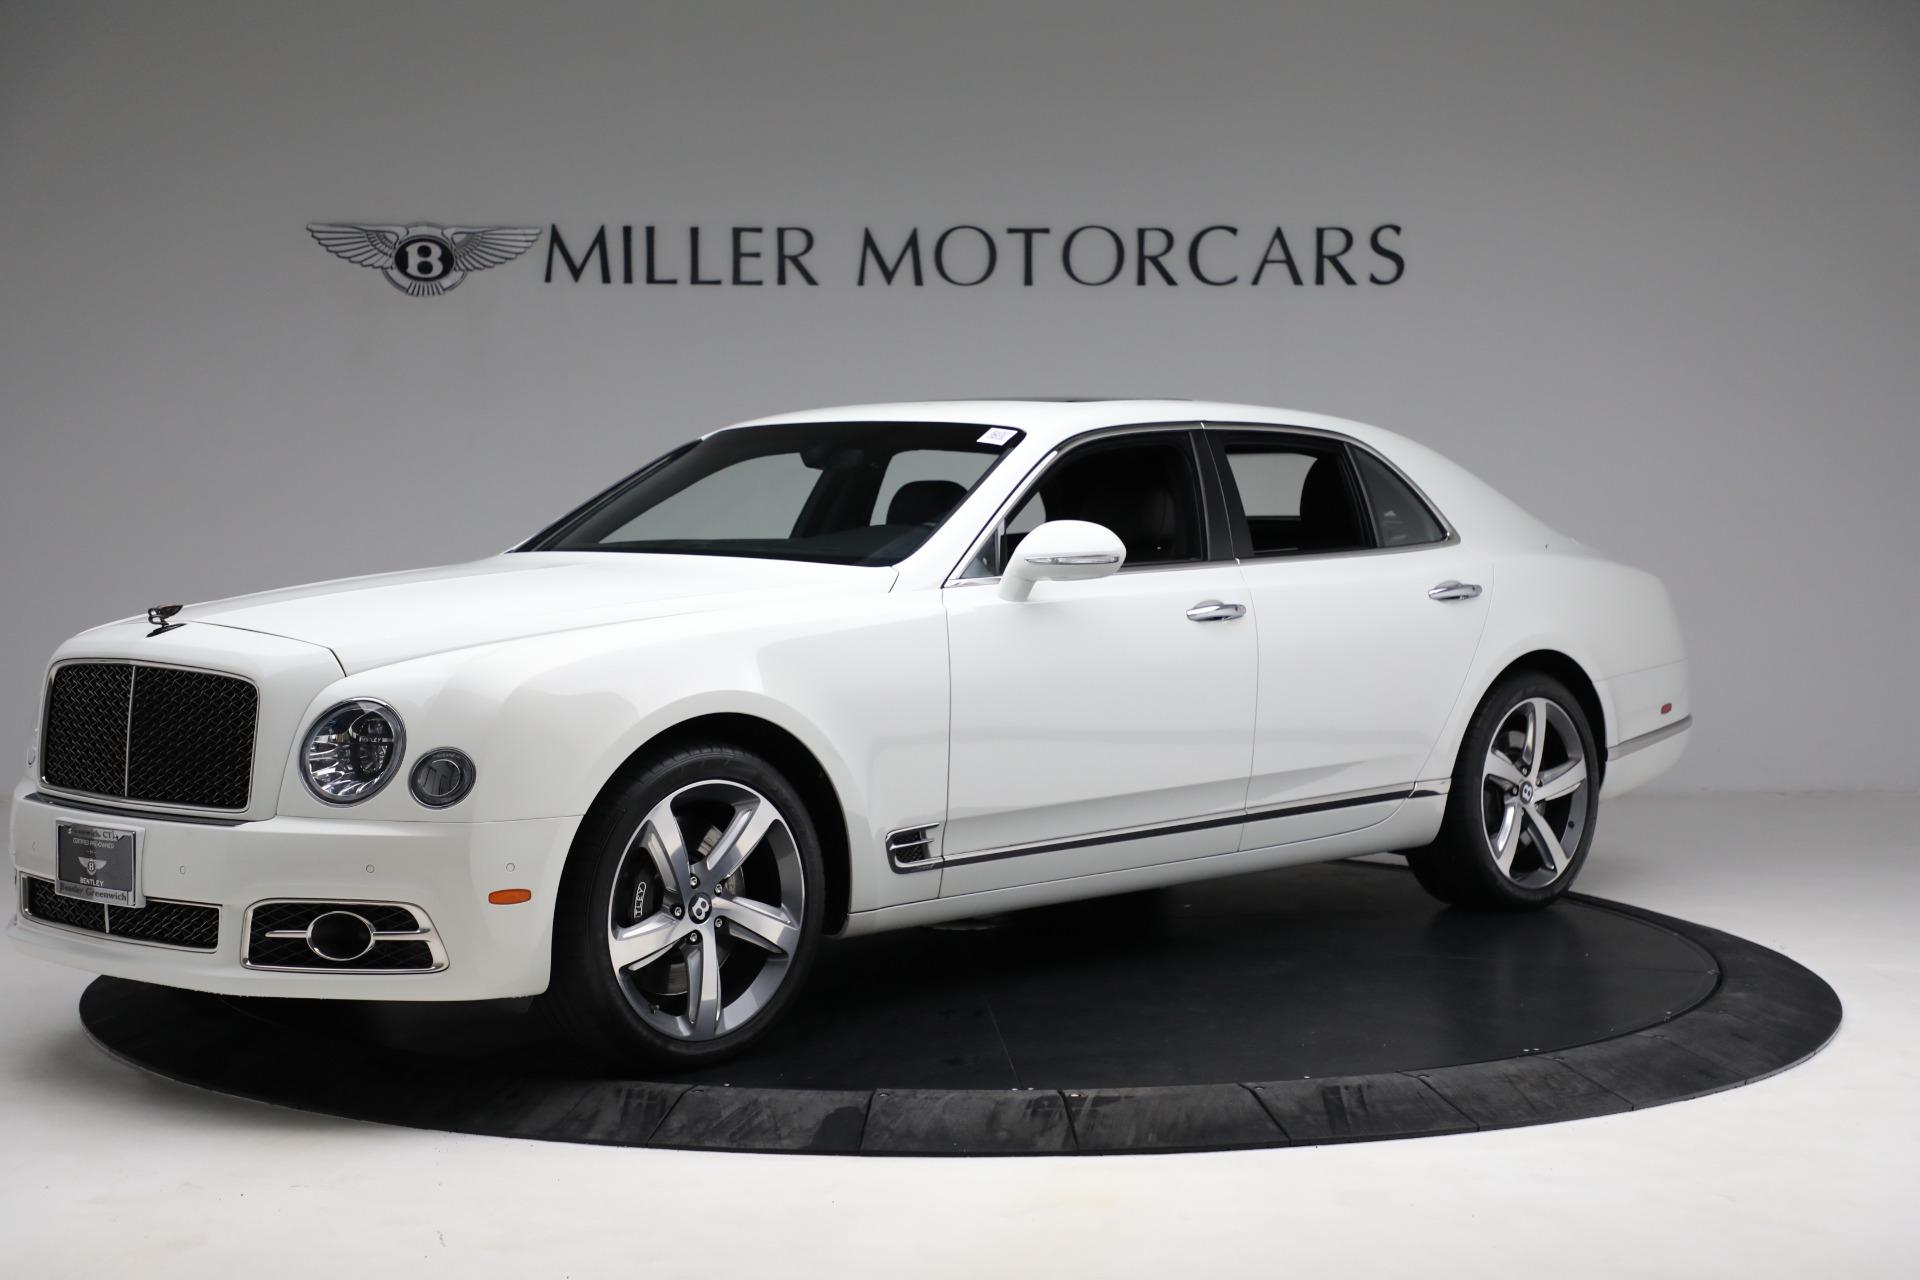 Used 2018 Bentley Mulsanne Speed for sale $228,900 at Rolls-Royce Motor Cars Greenwich in Greenwich CT 06830 1